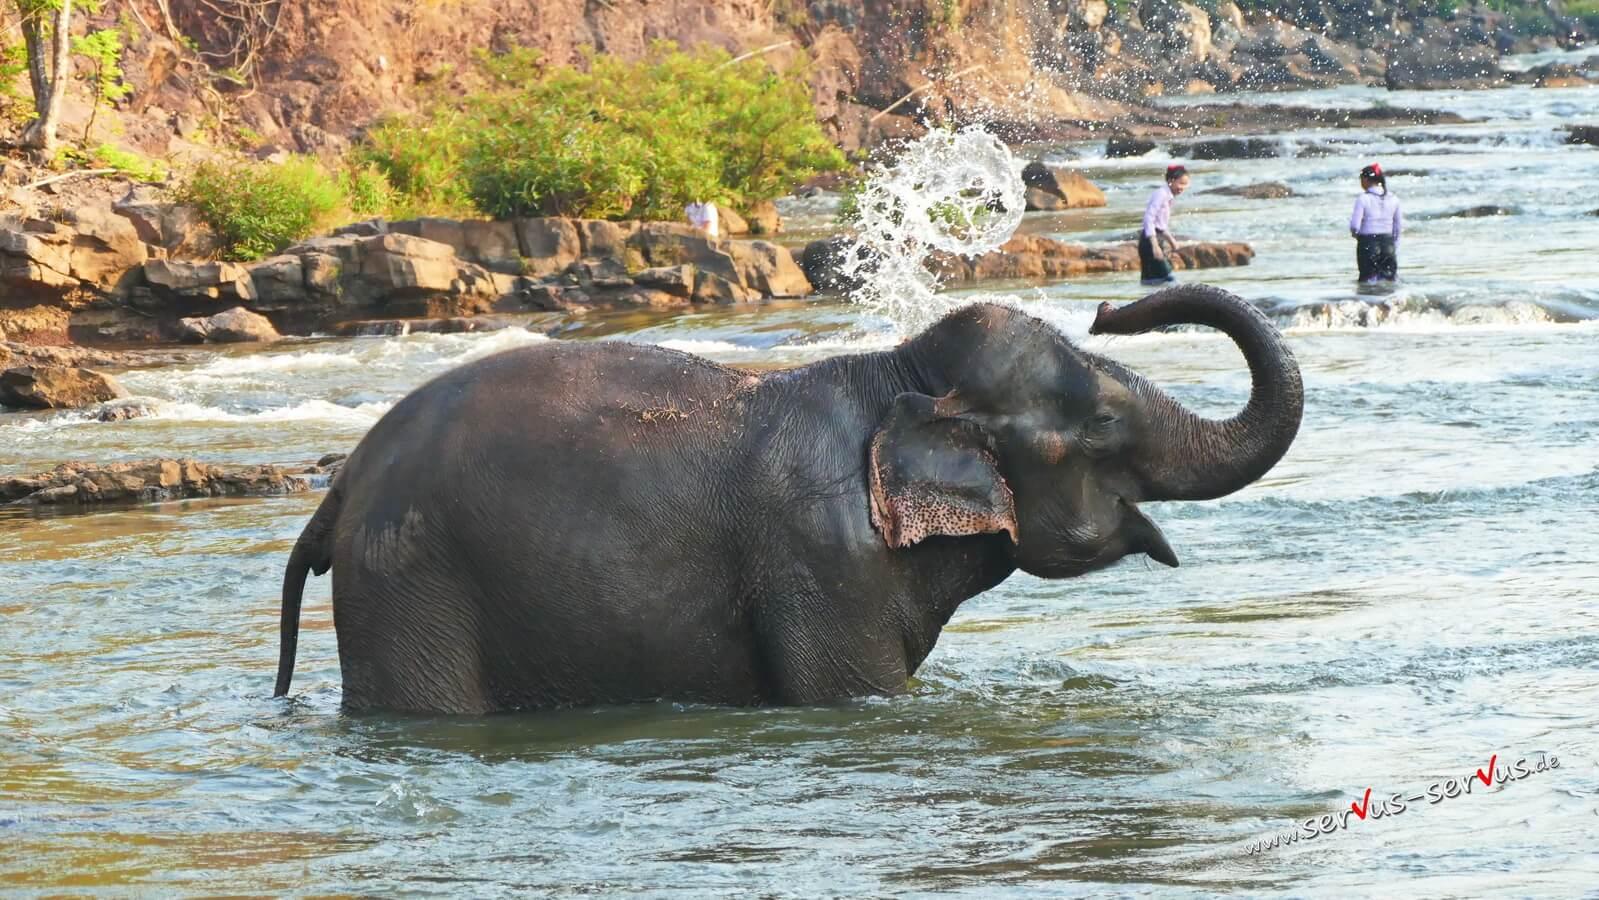 Wasser, Elefant beim Baden, Laos, Bolavenplateau